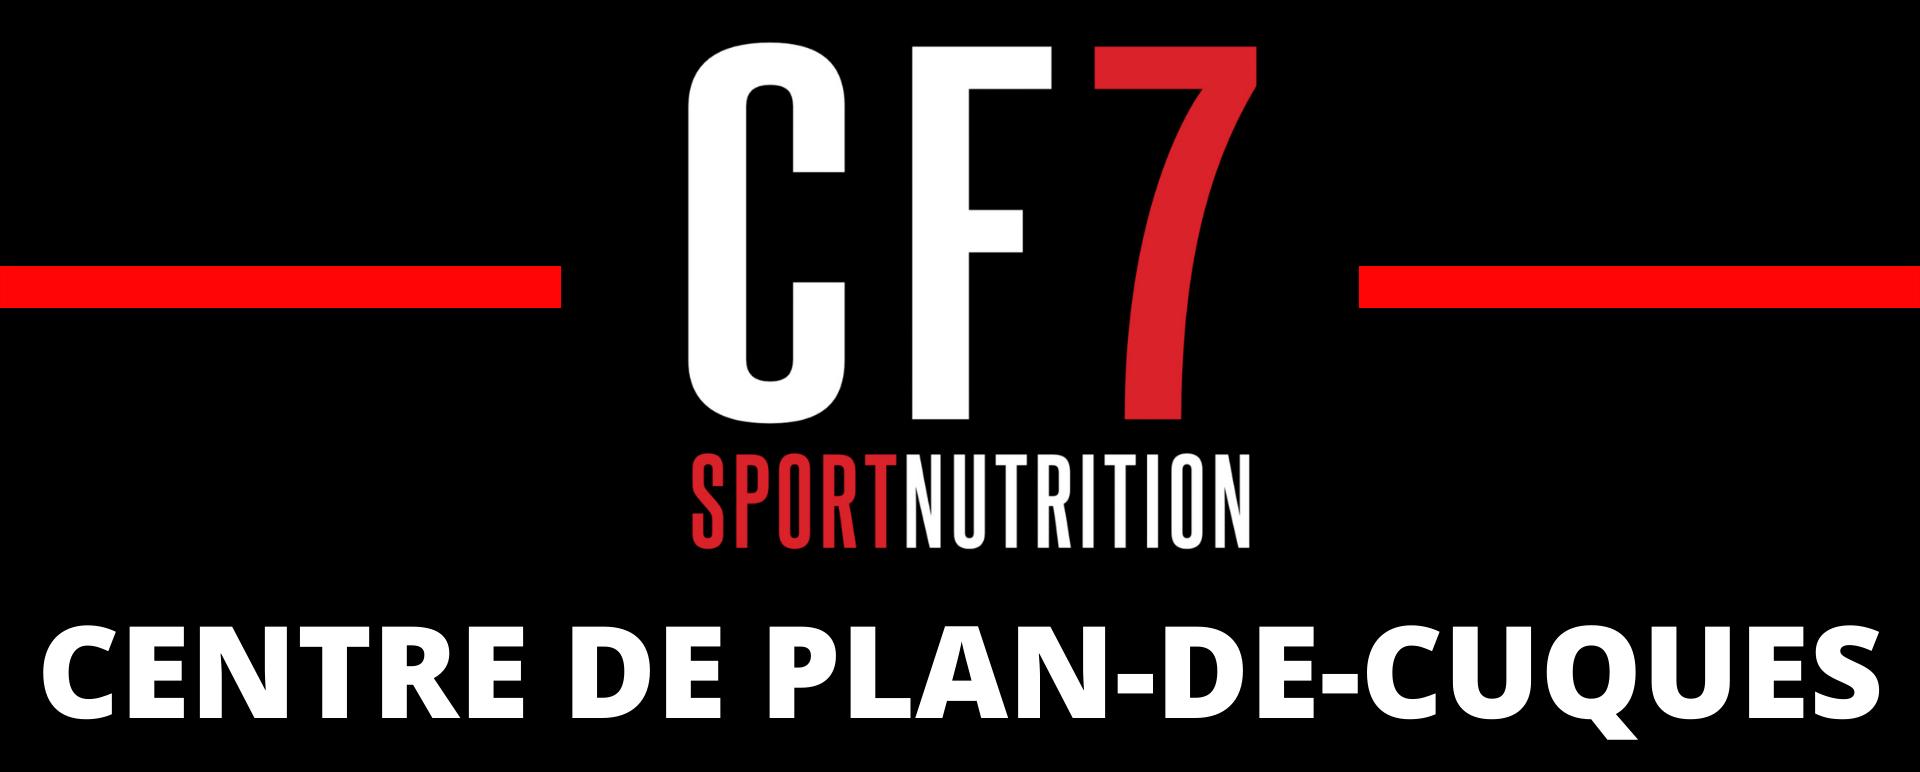 CF7 PLAN-DE-CUQUES